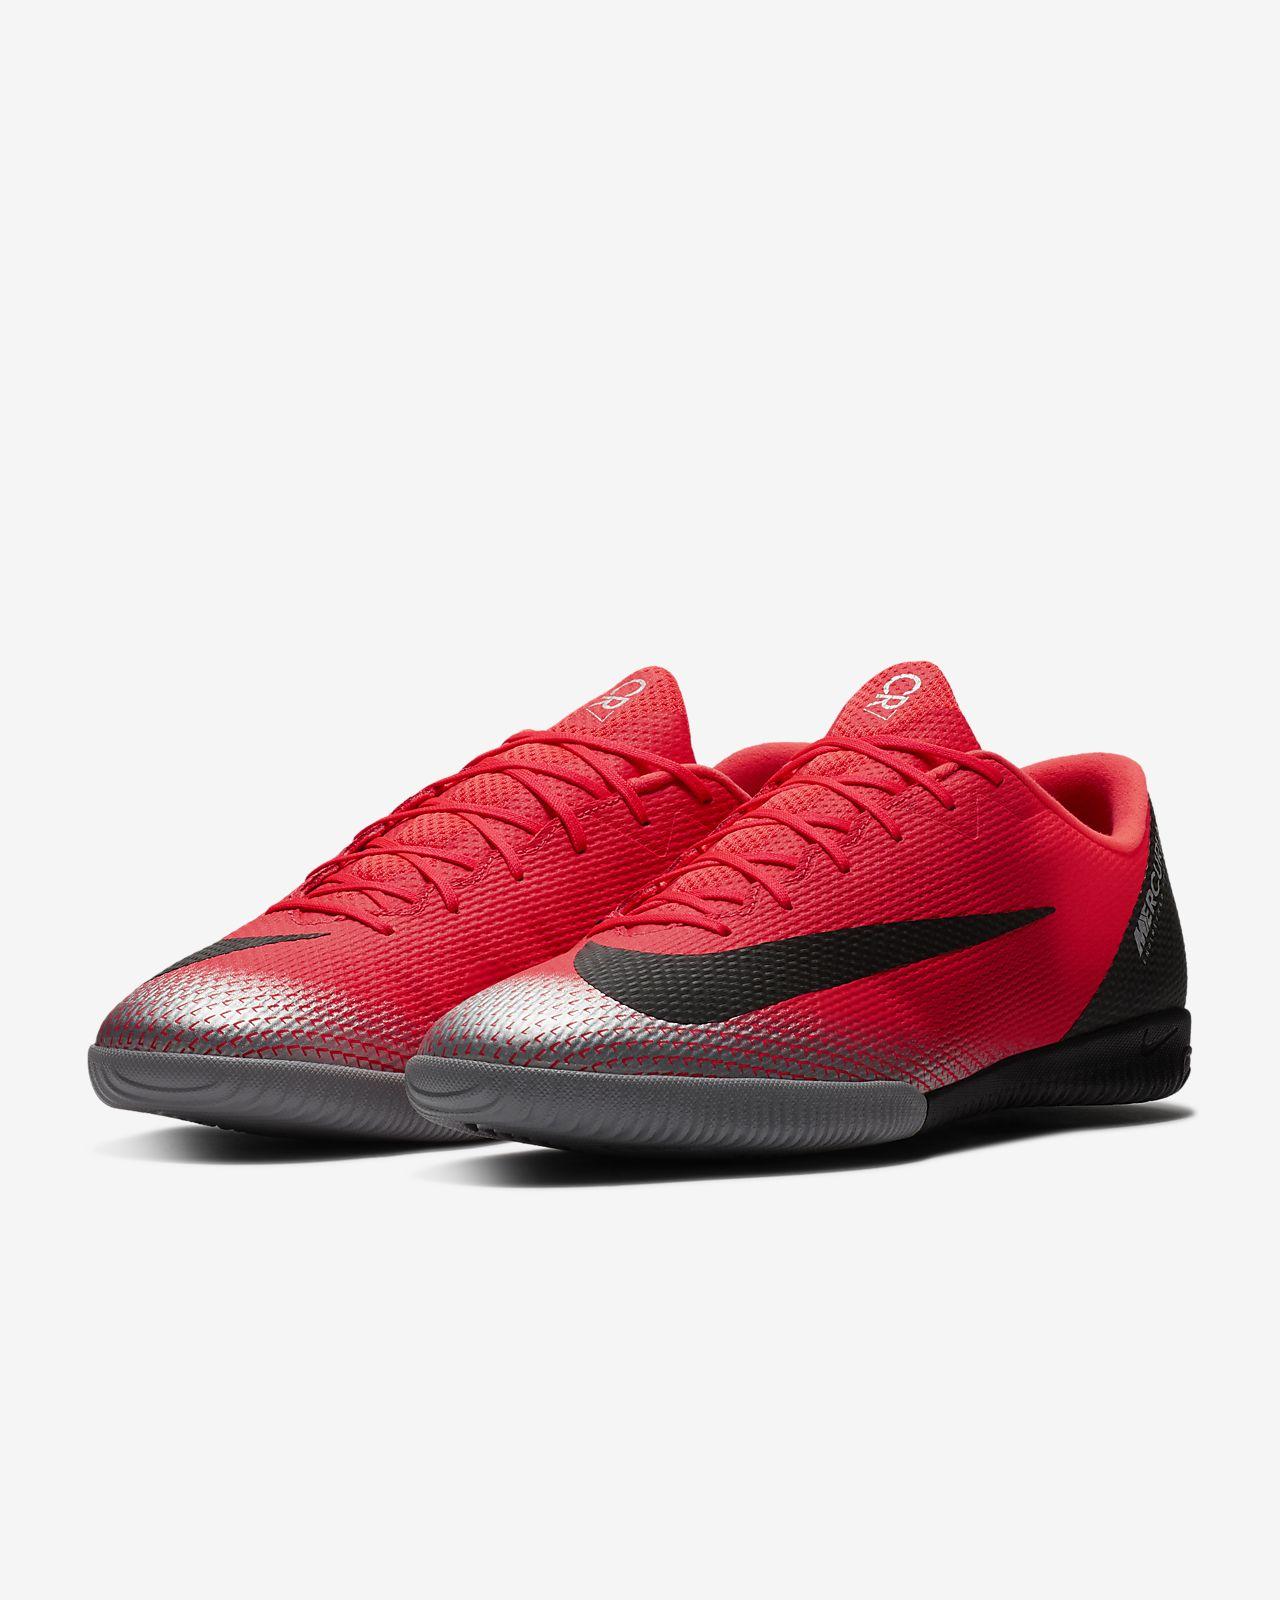 15b9a060dc81 Nike MercurialX Vapor XII Academy CR7 Indoor Court Football Shoe ...